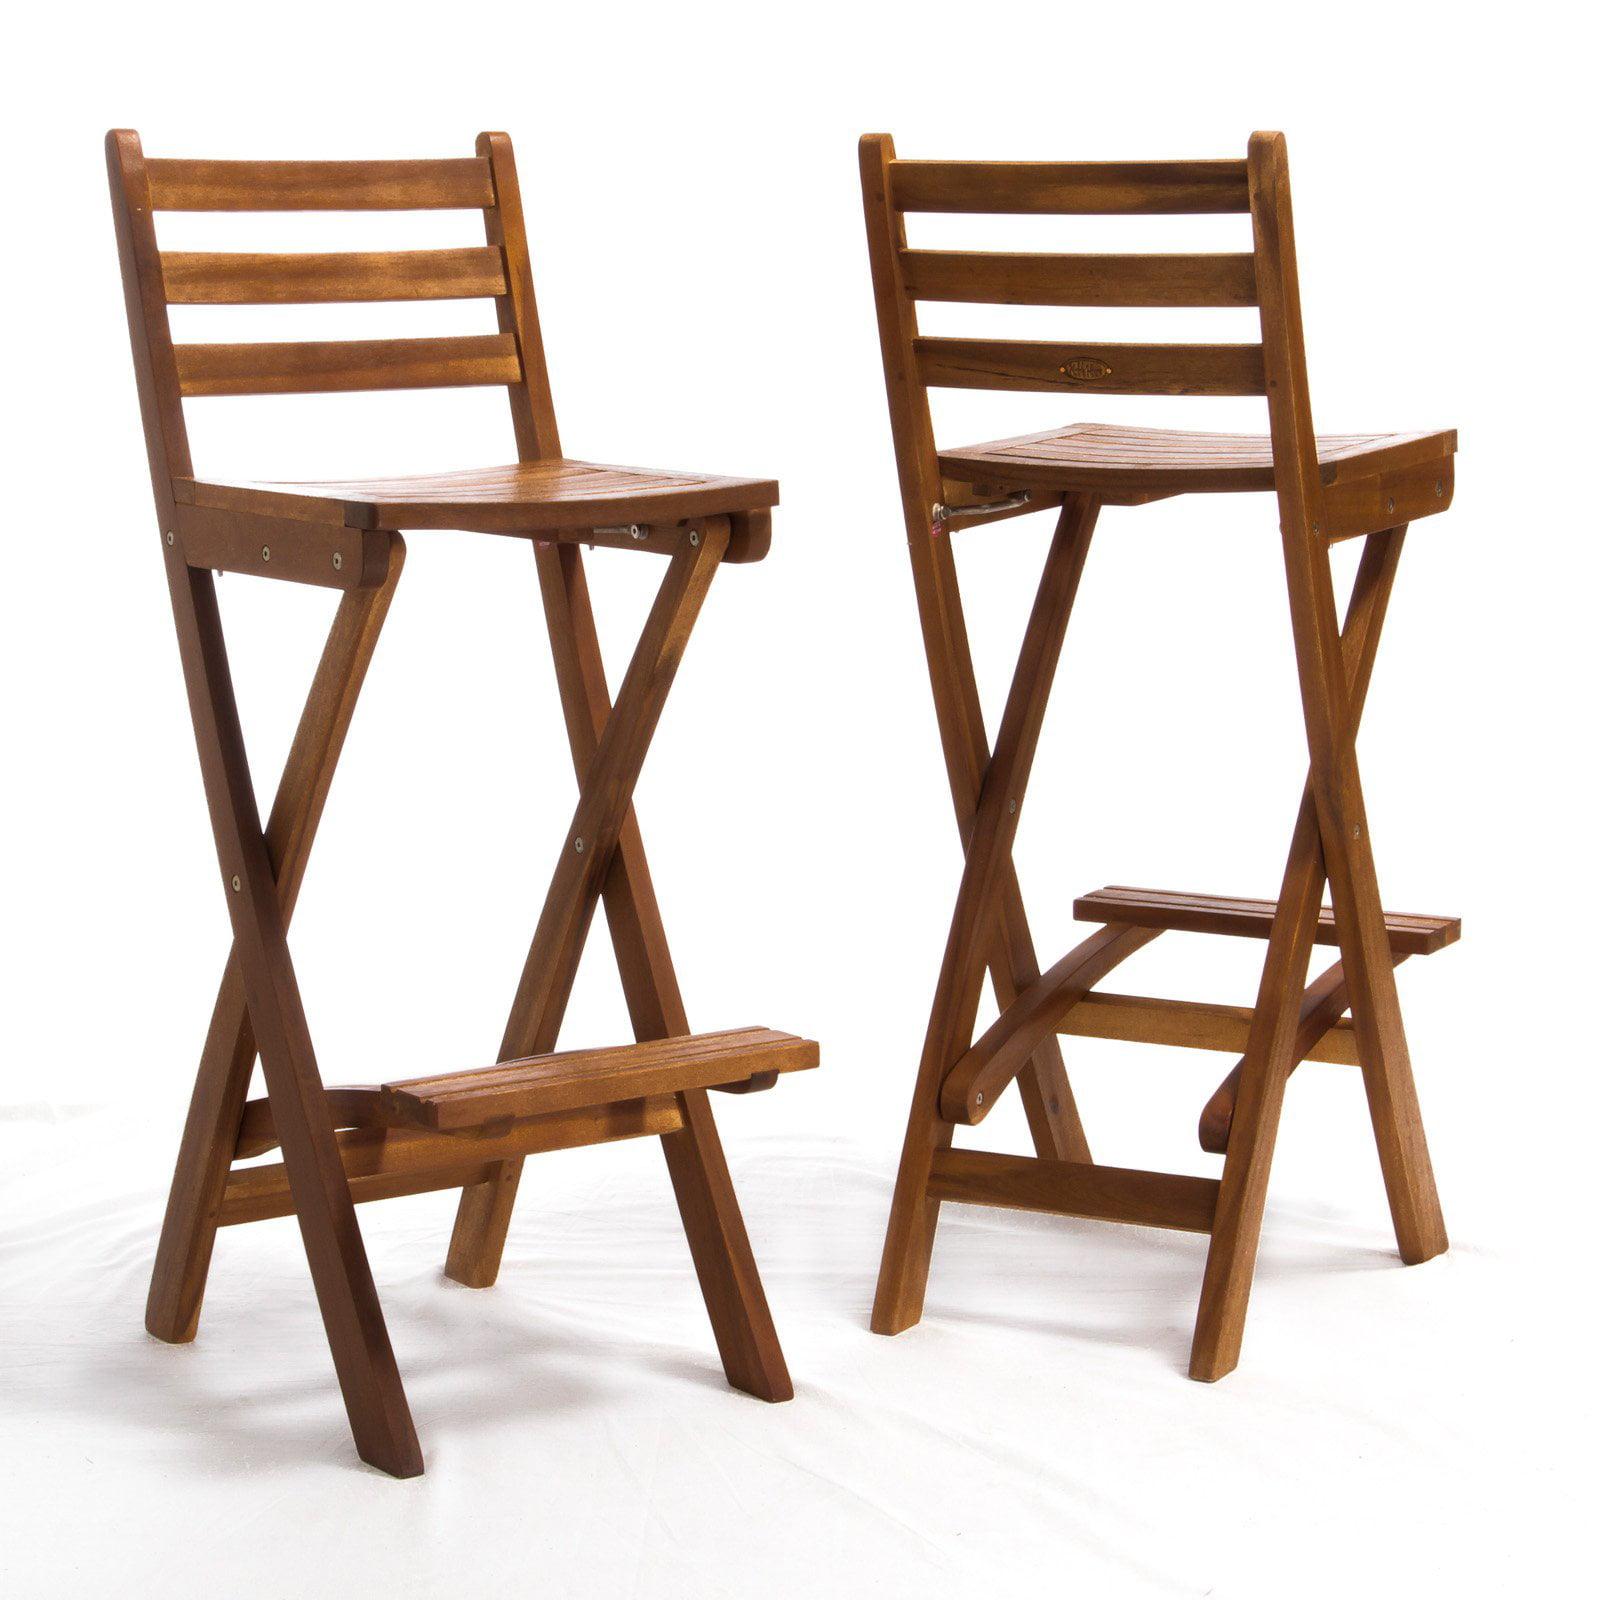 Folding kitchen stools with backs - Tundra Foldable Outdoor Wood Barstool